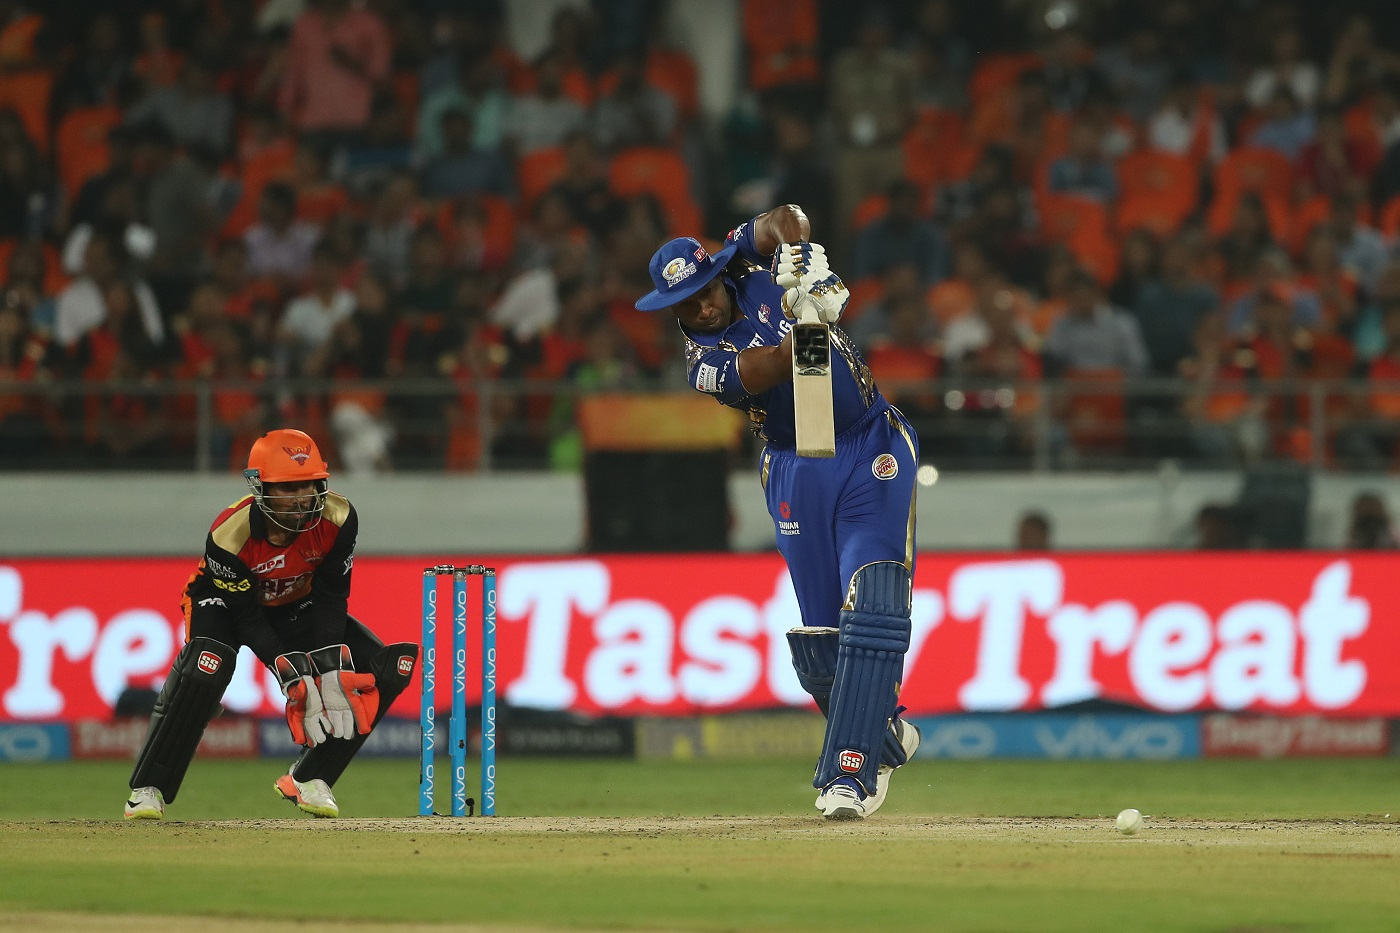 SRH vs MI IPL 2018 MATCH No 7